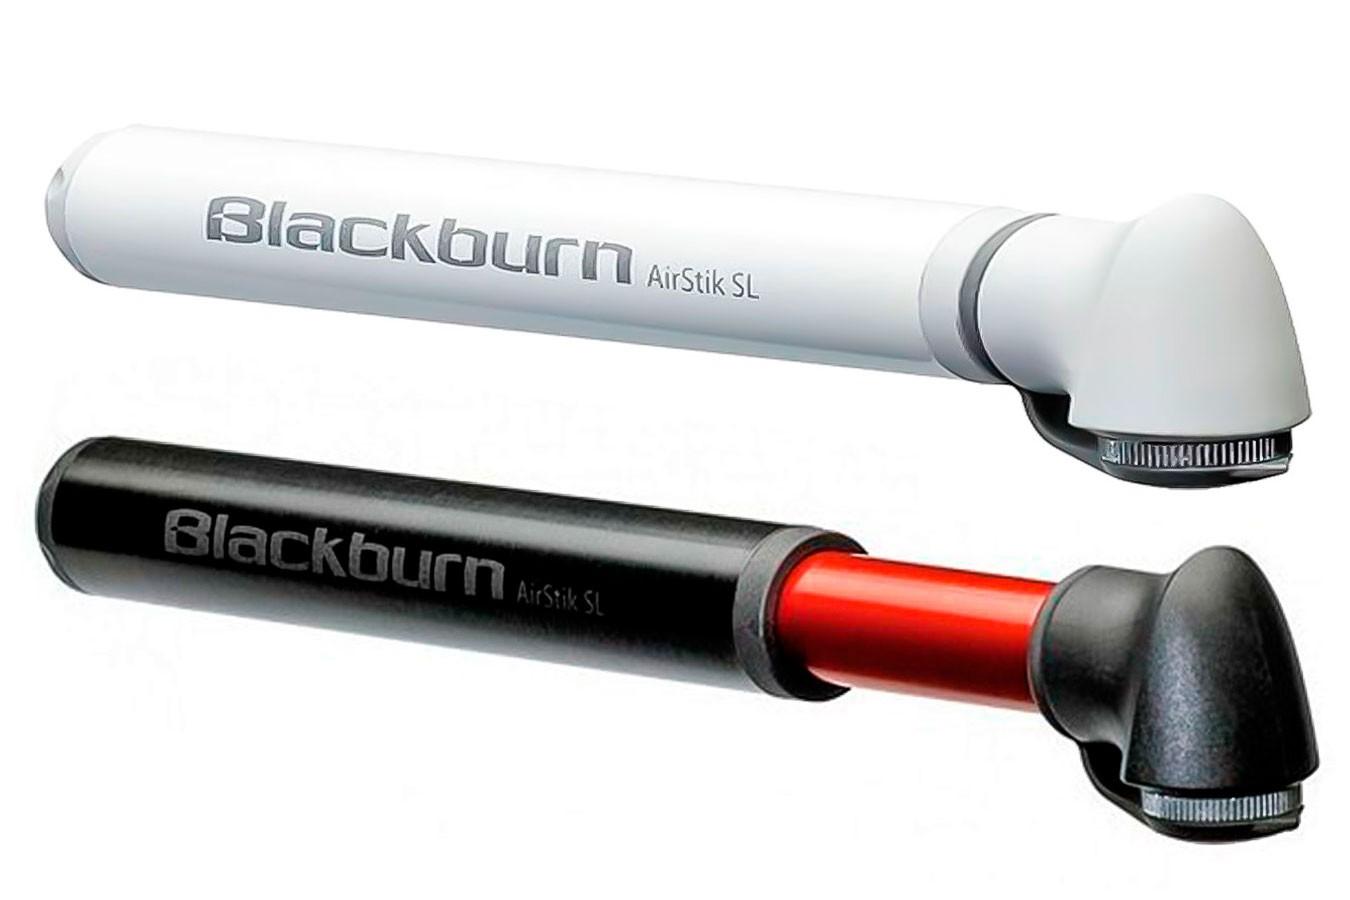 Bomba Ar de Mão Airstik SL - Blackburn